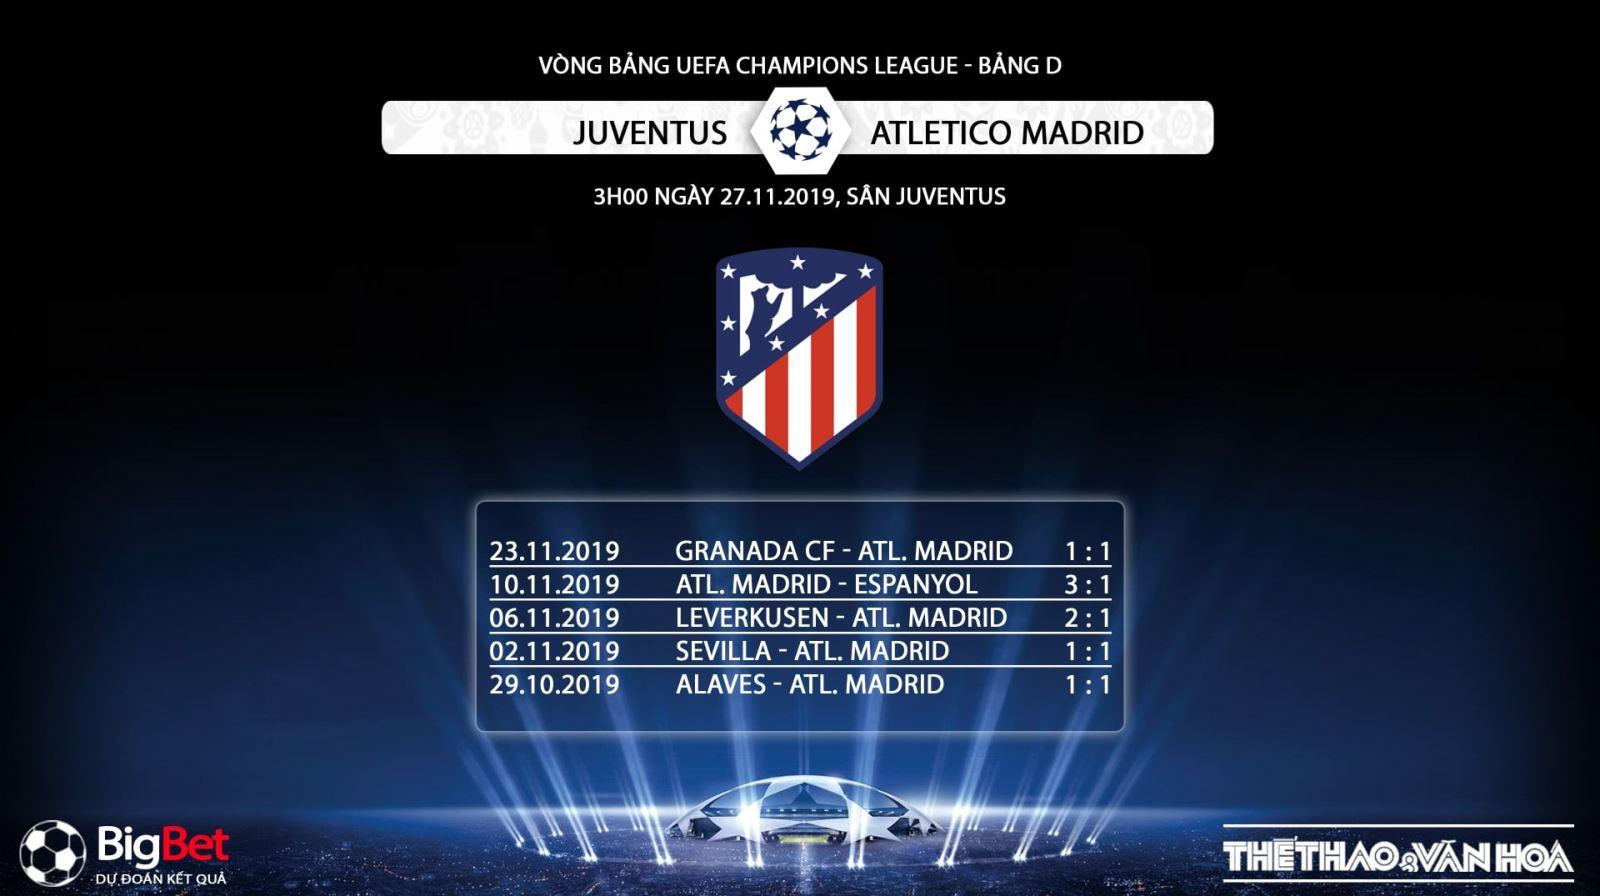 Soi kèo Juventus vs Atletico Madrid, Juventus, Atletico Madrid, soi kèo bóng đá, trực tiếp Juventus vs Atletico Madrid, K+, K+PM, K+PC